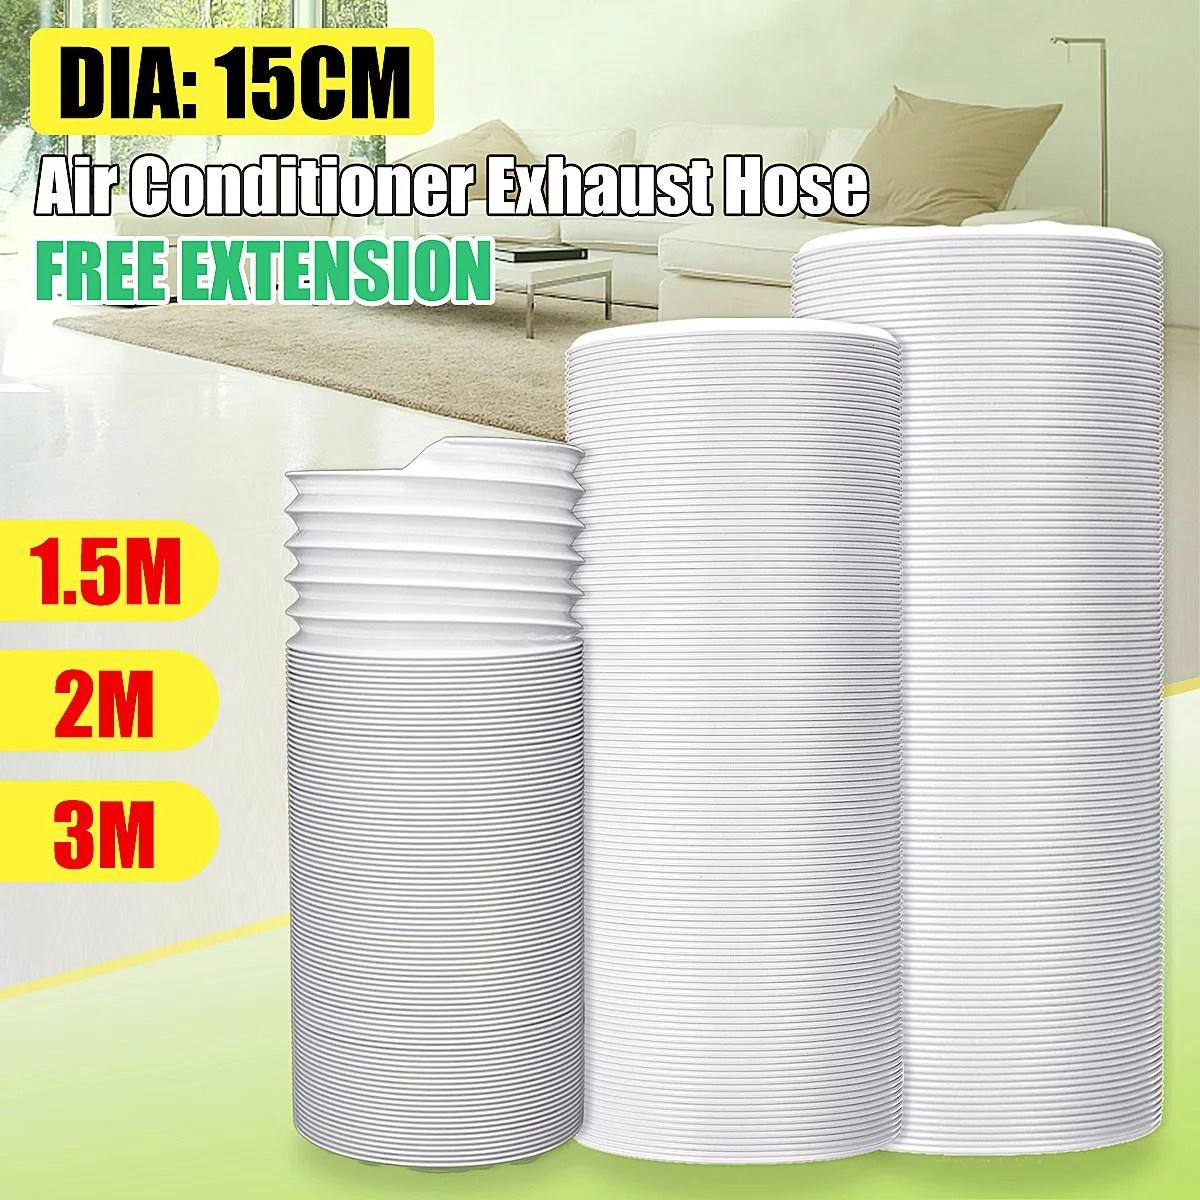 59 118 flexible exhaust hose 15cm 5 9 diameter free extension for portable air conditioner